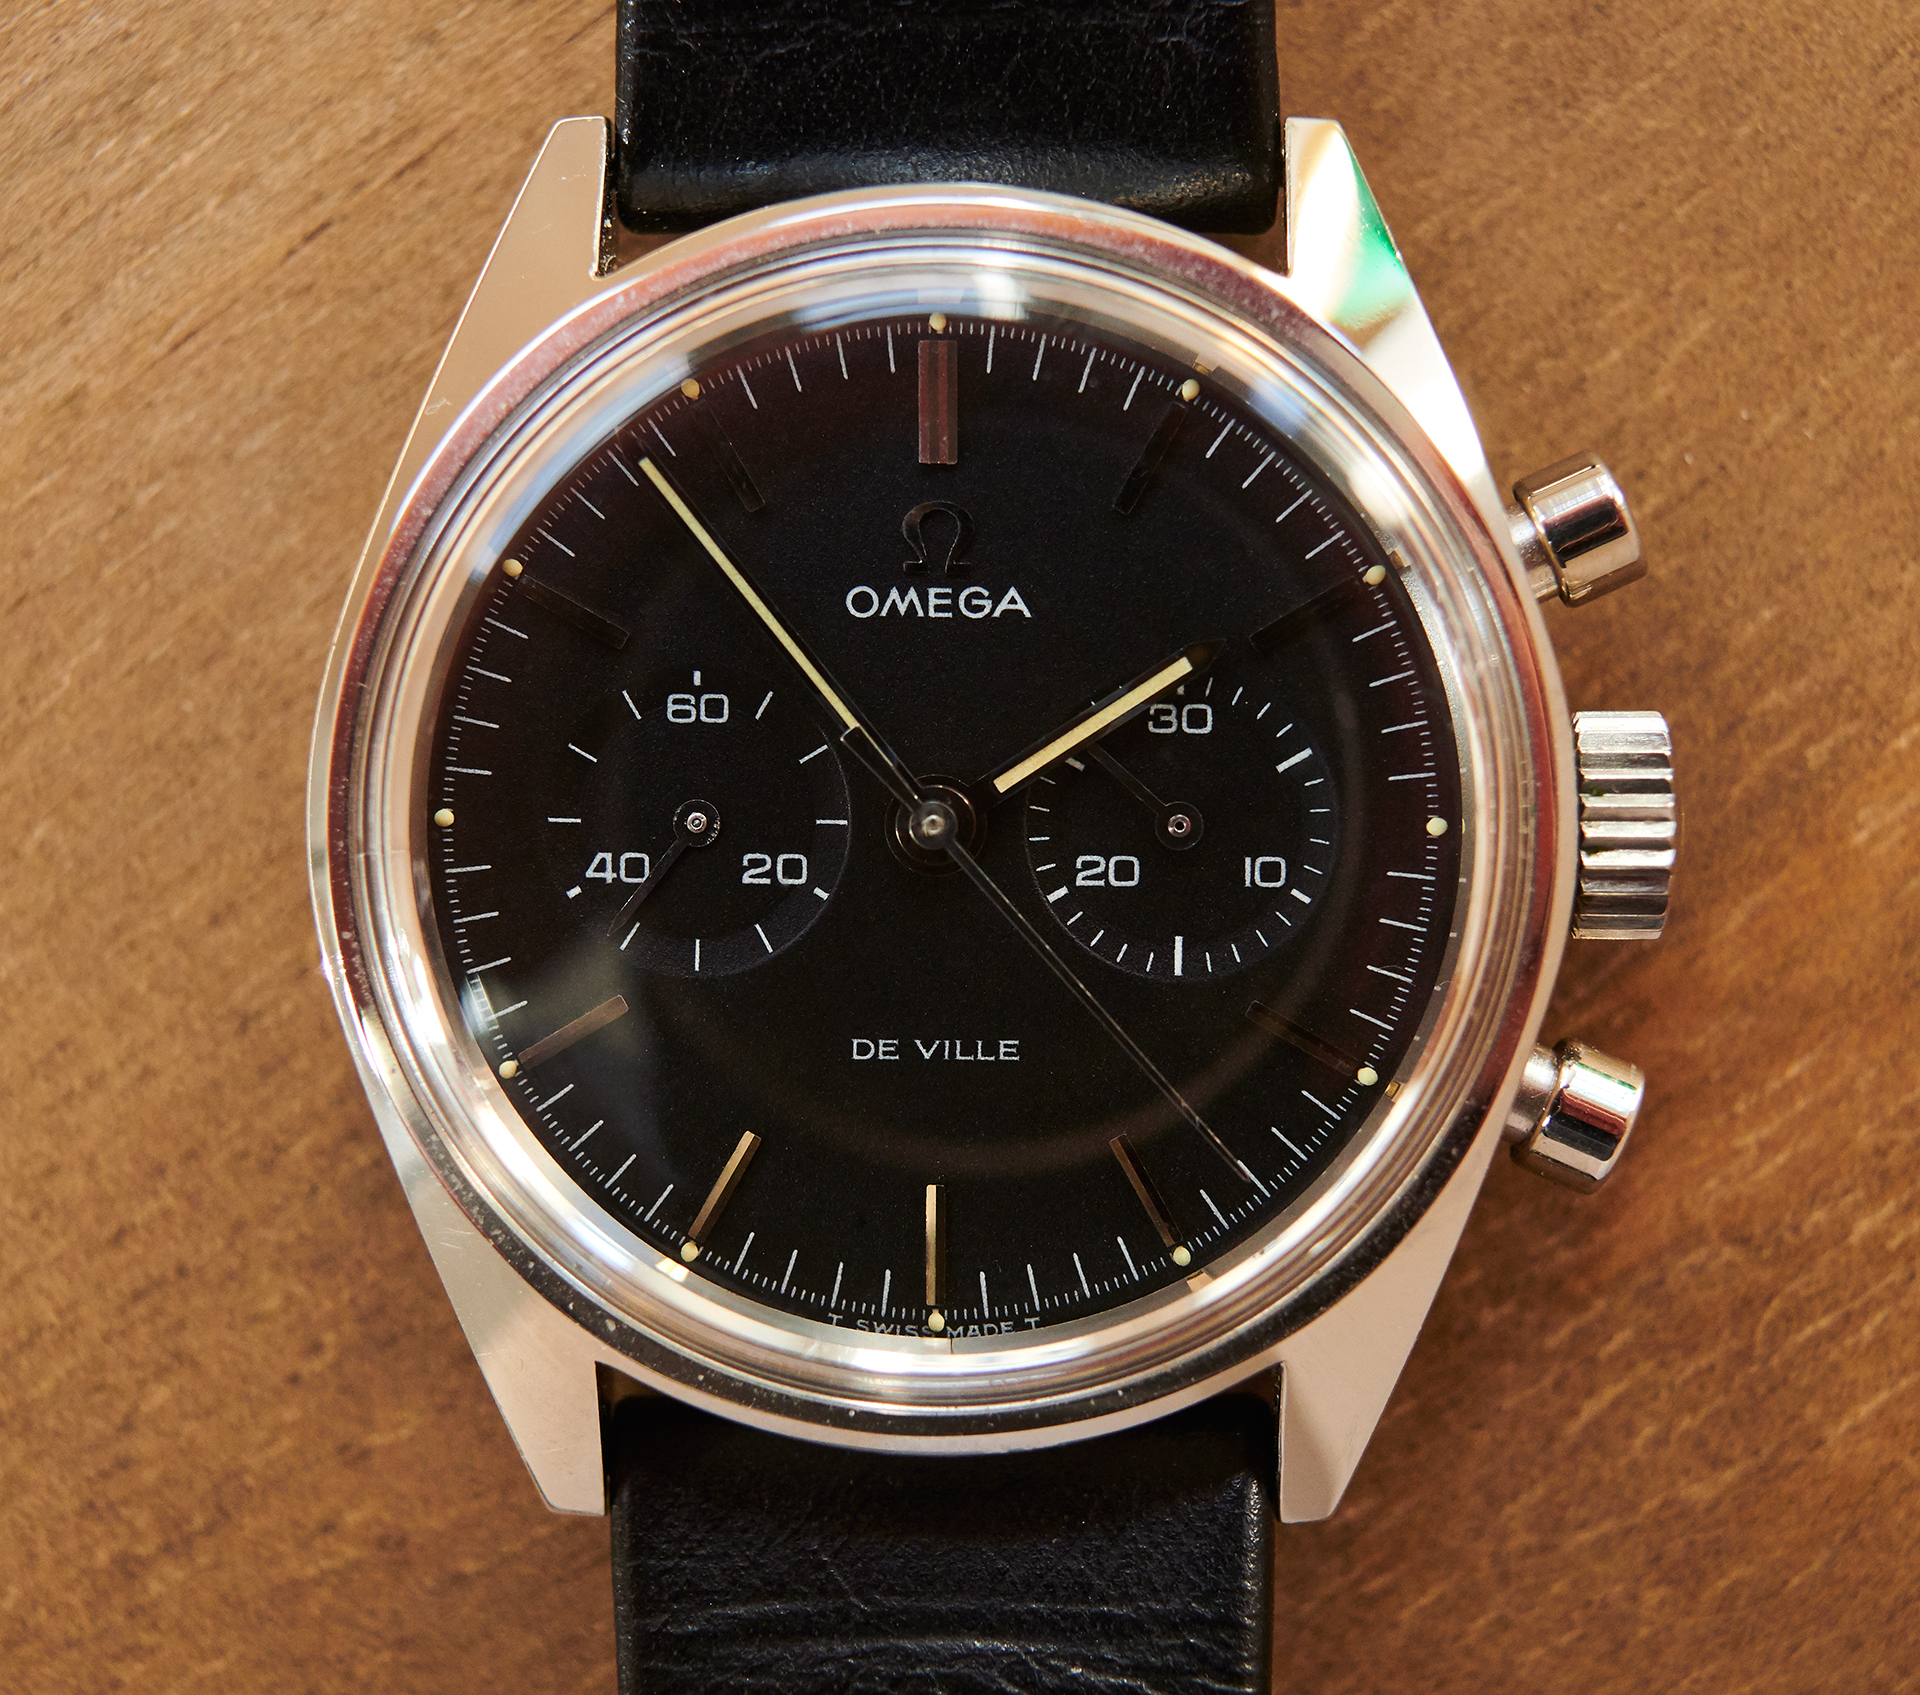 Omega DeVille 145.017 / Prototype 1968